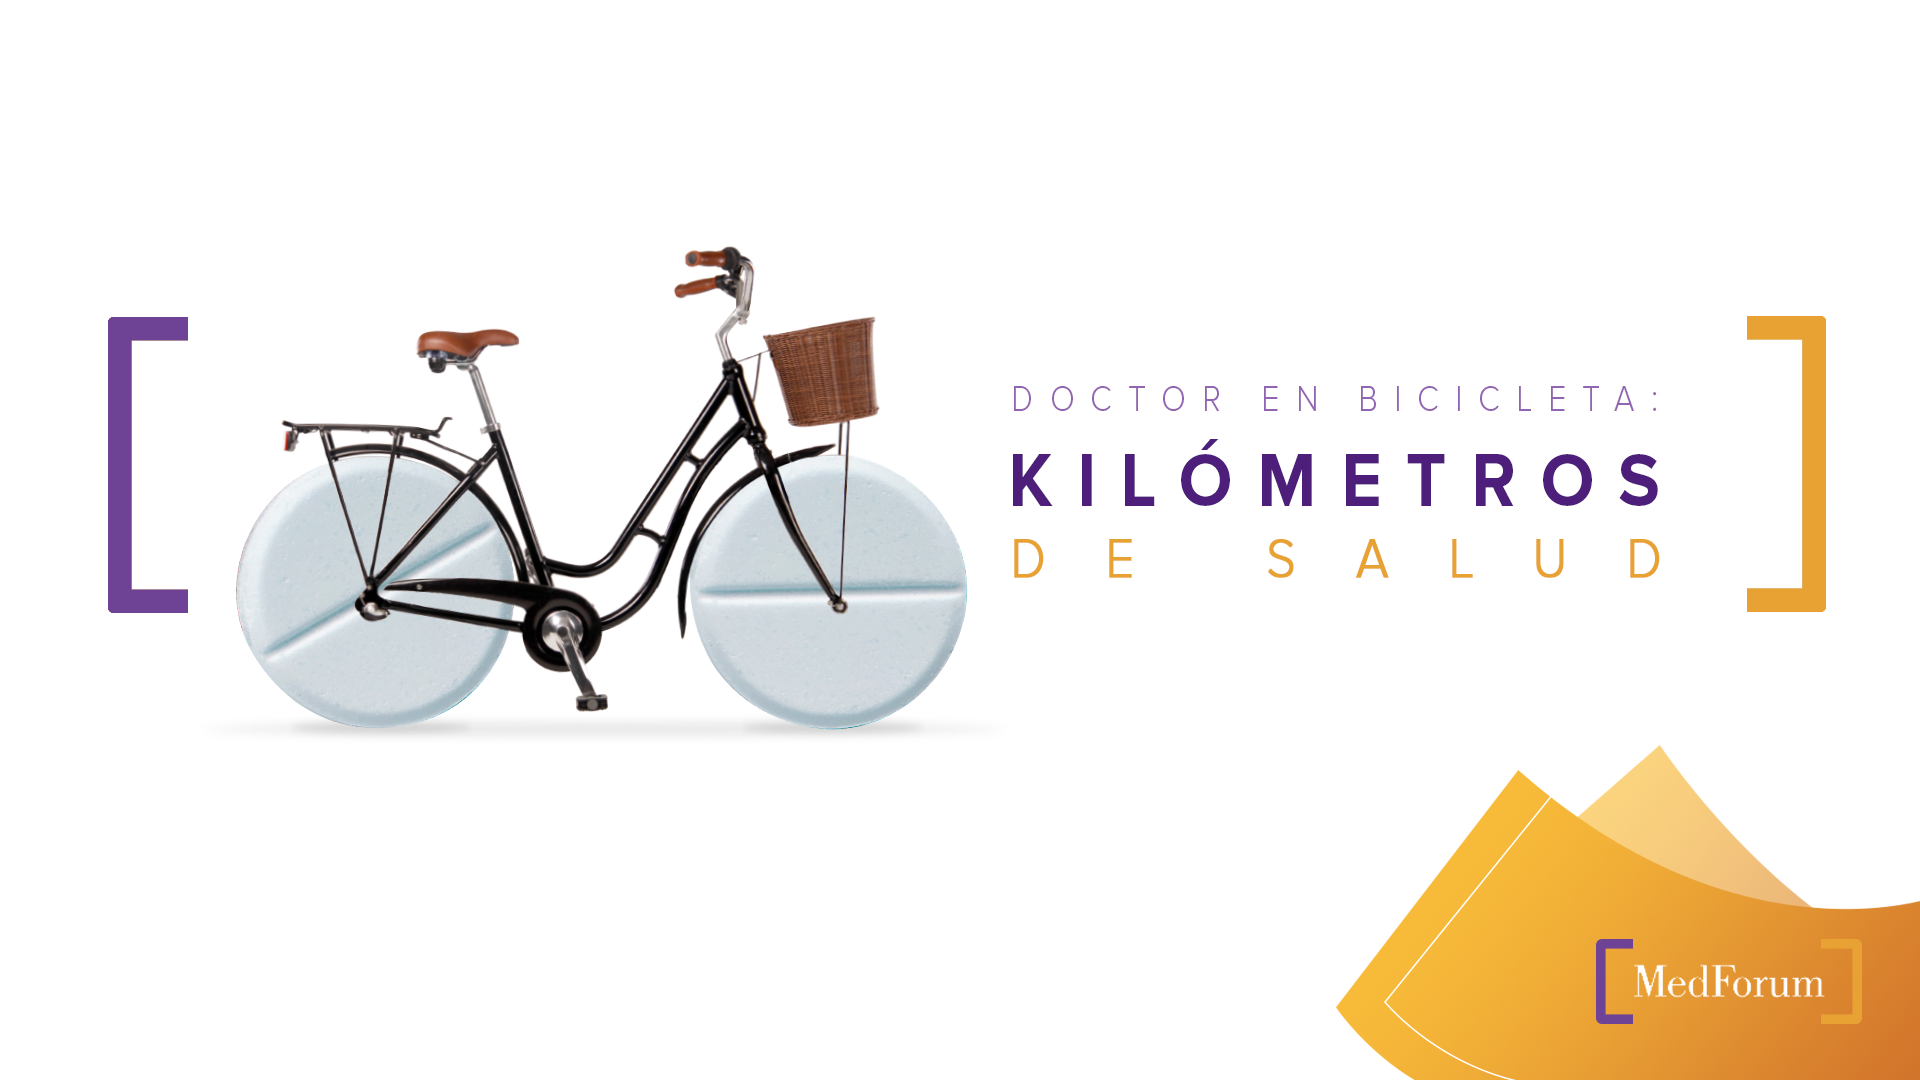 Doctor en bicicleta